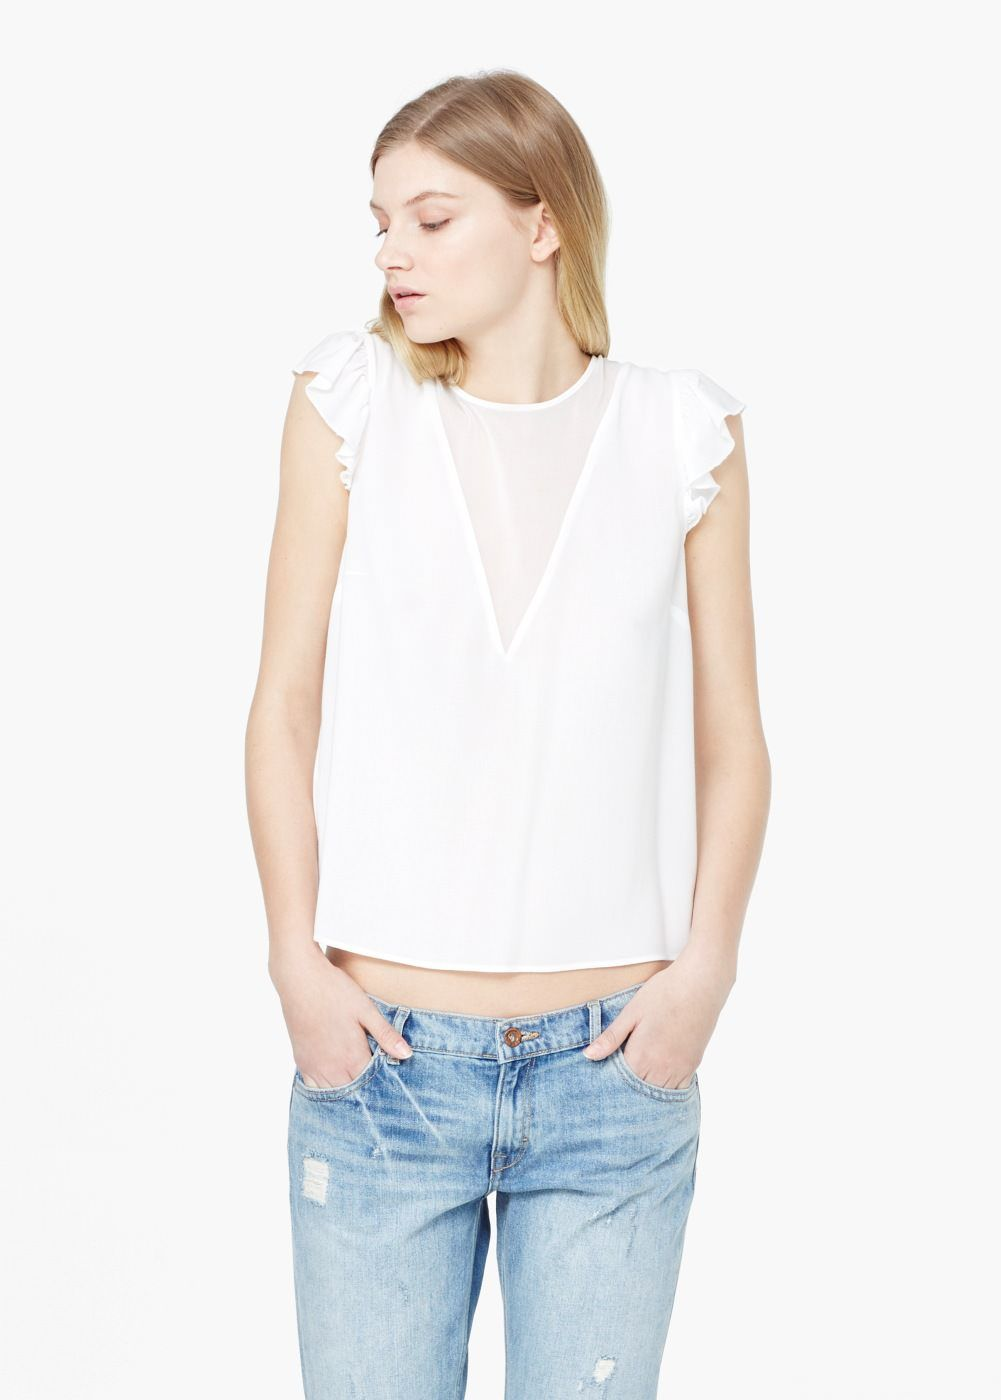 728ad06199f8 Ruffle sleeves blouse - Woman